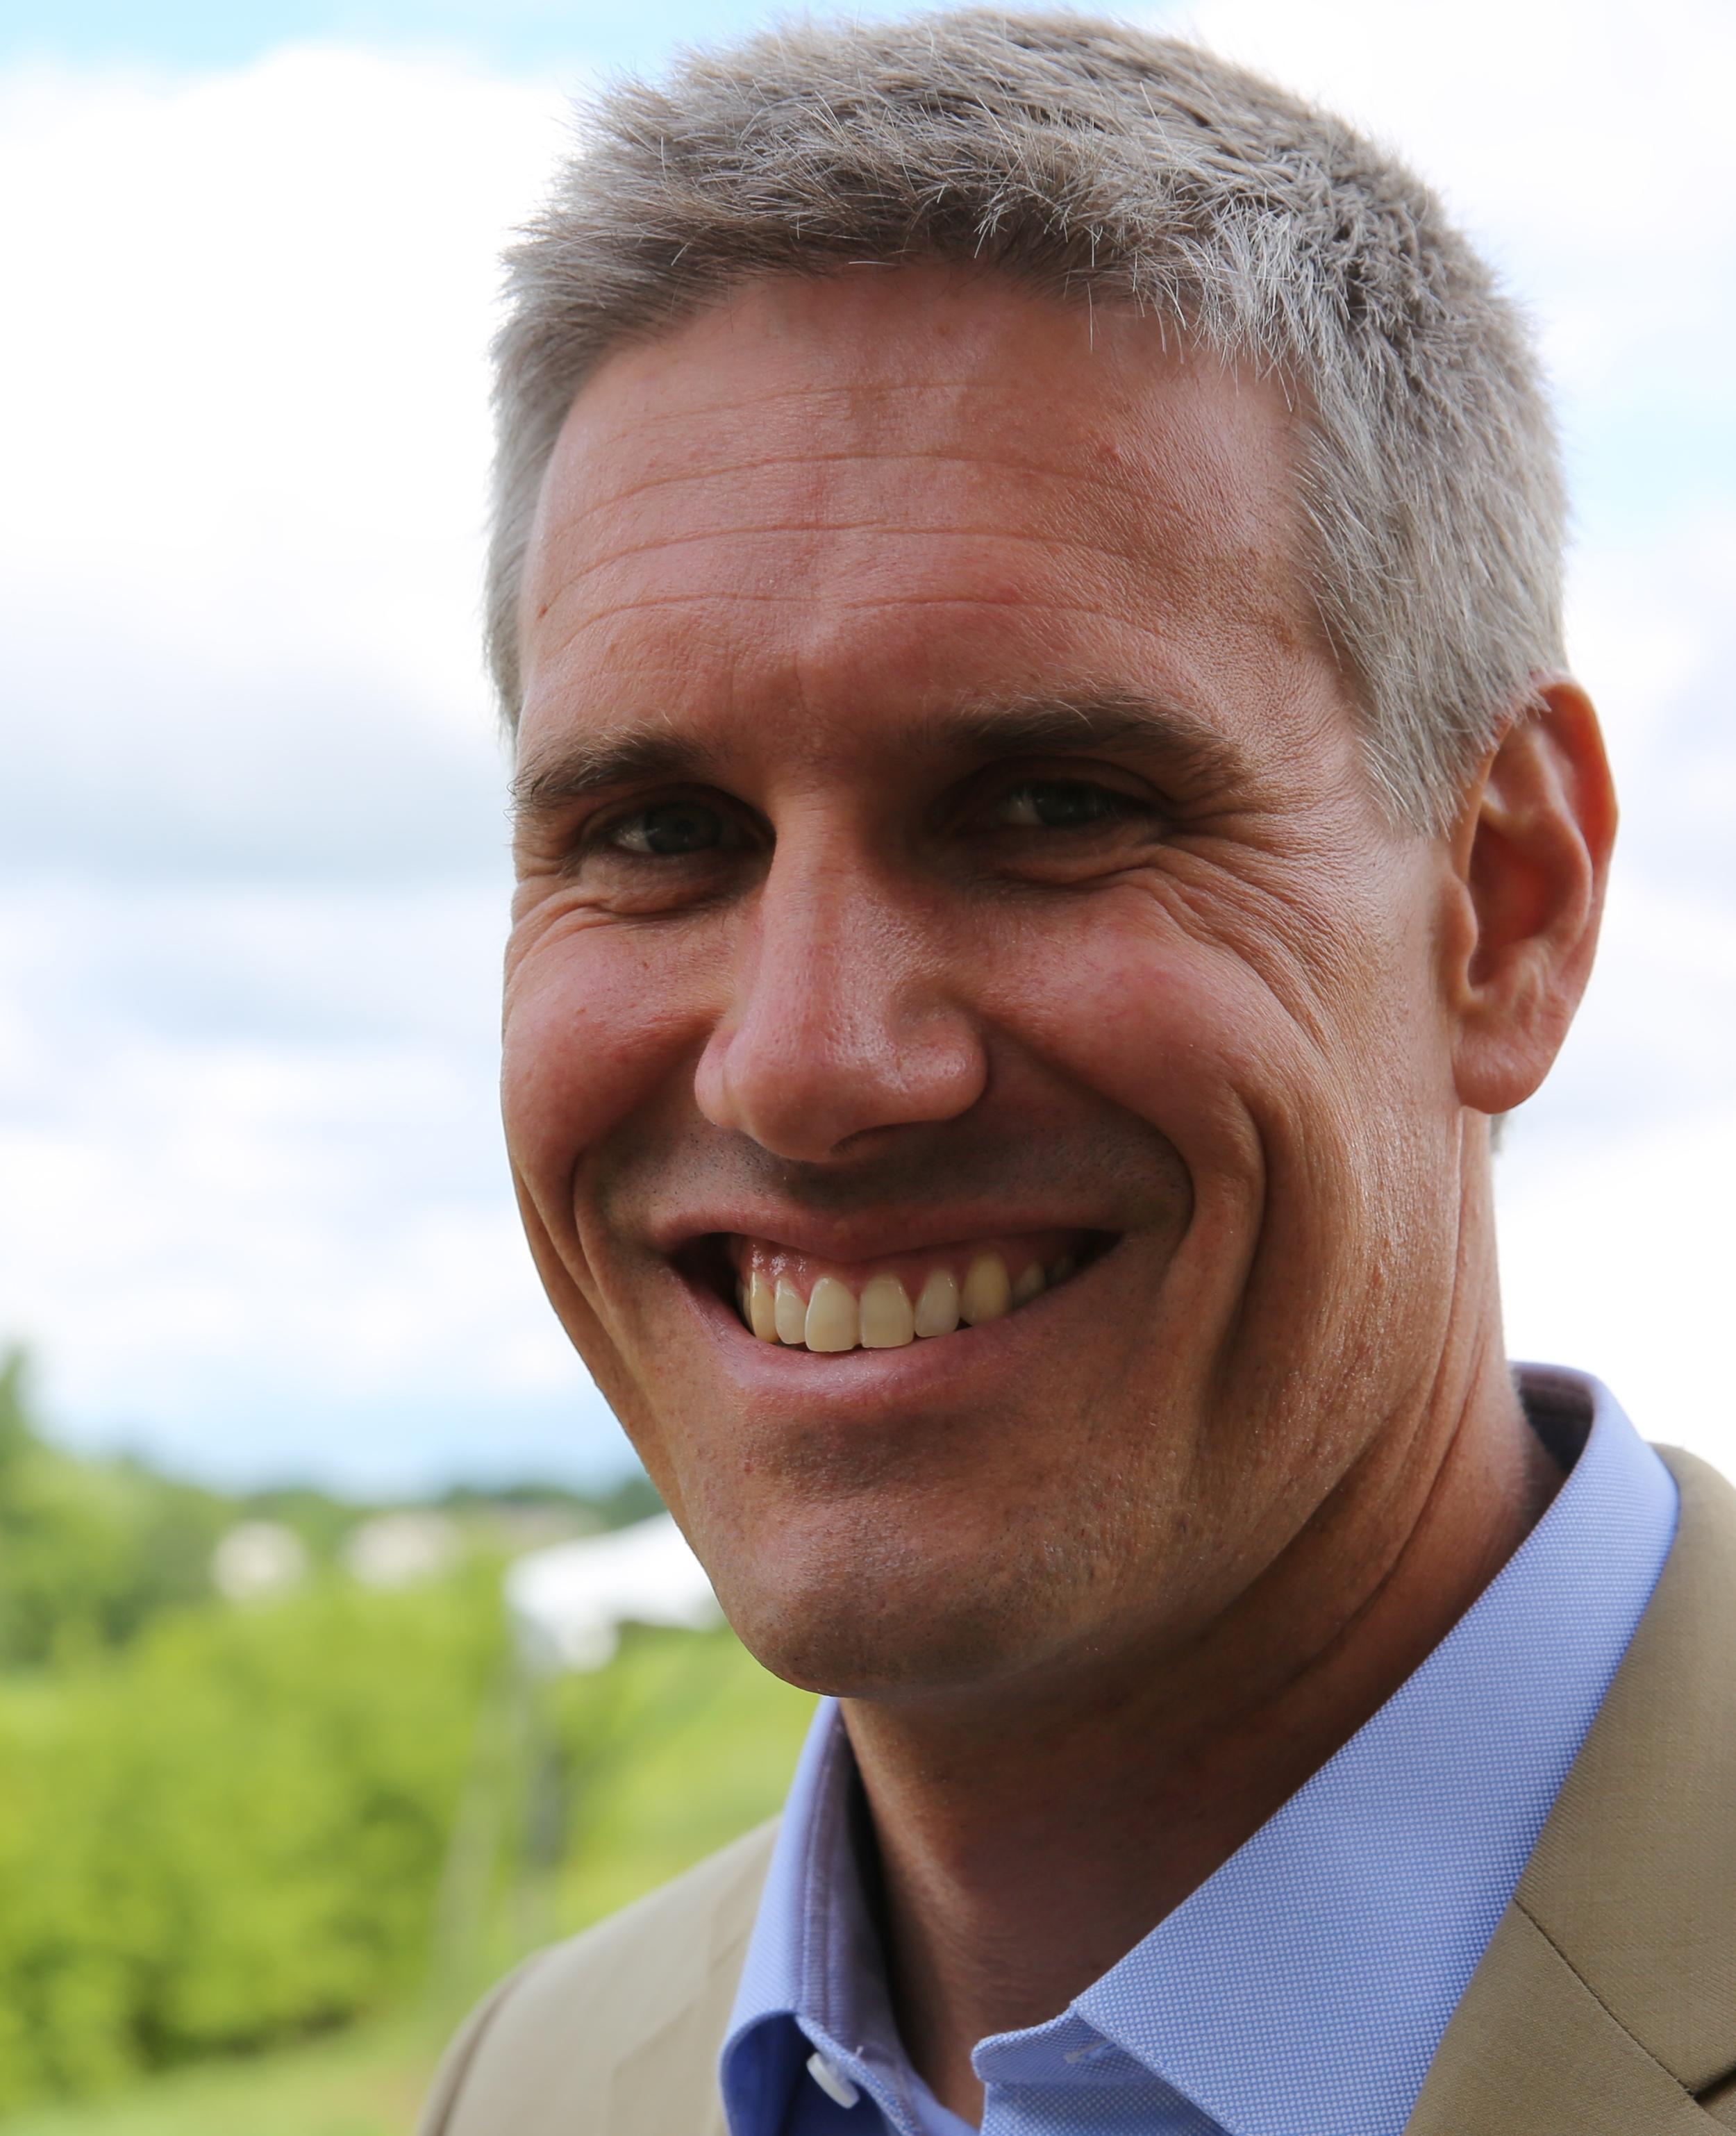 Robert Thomas, producer